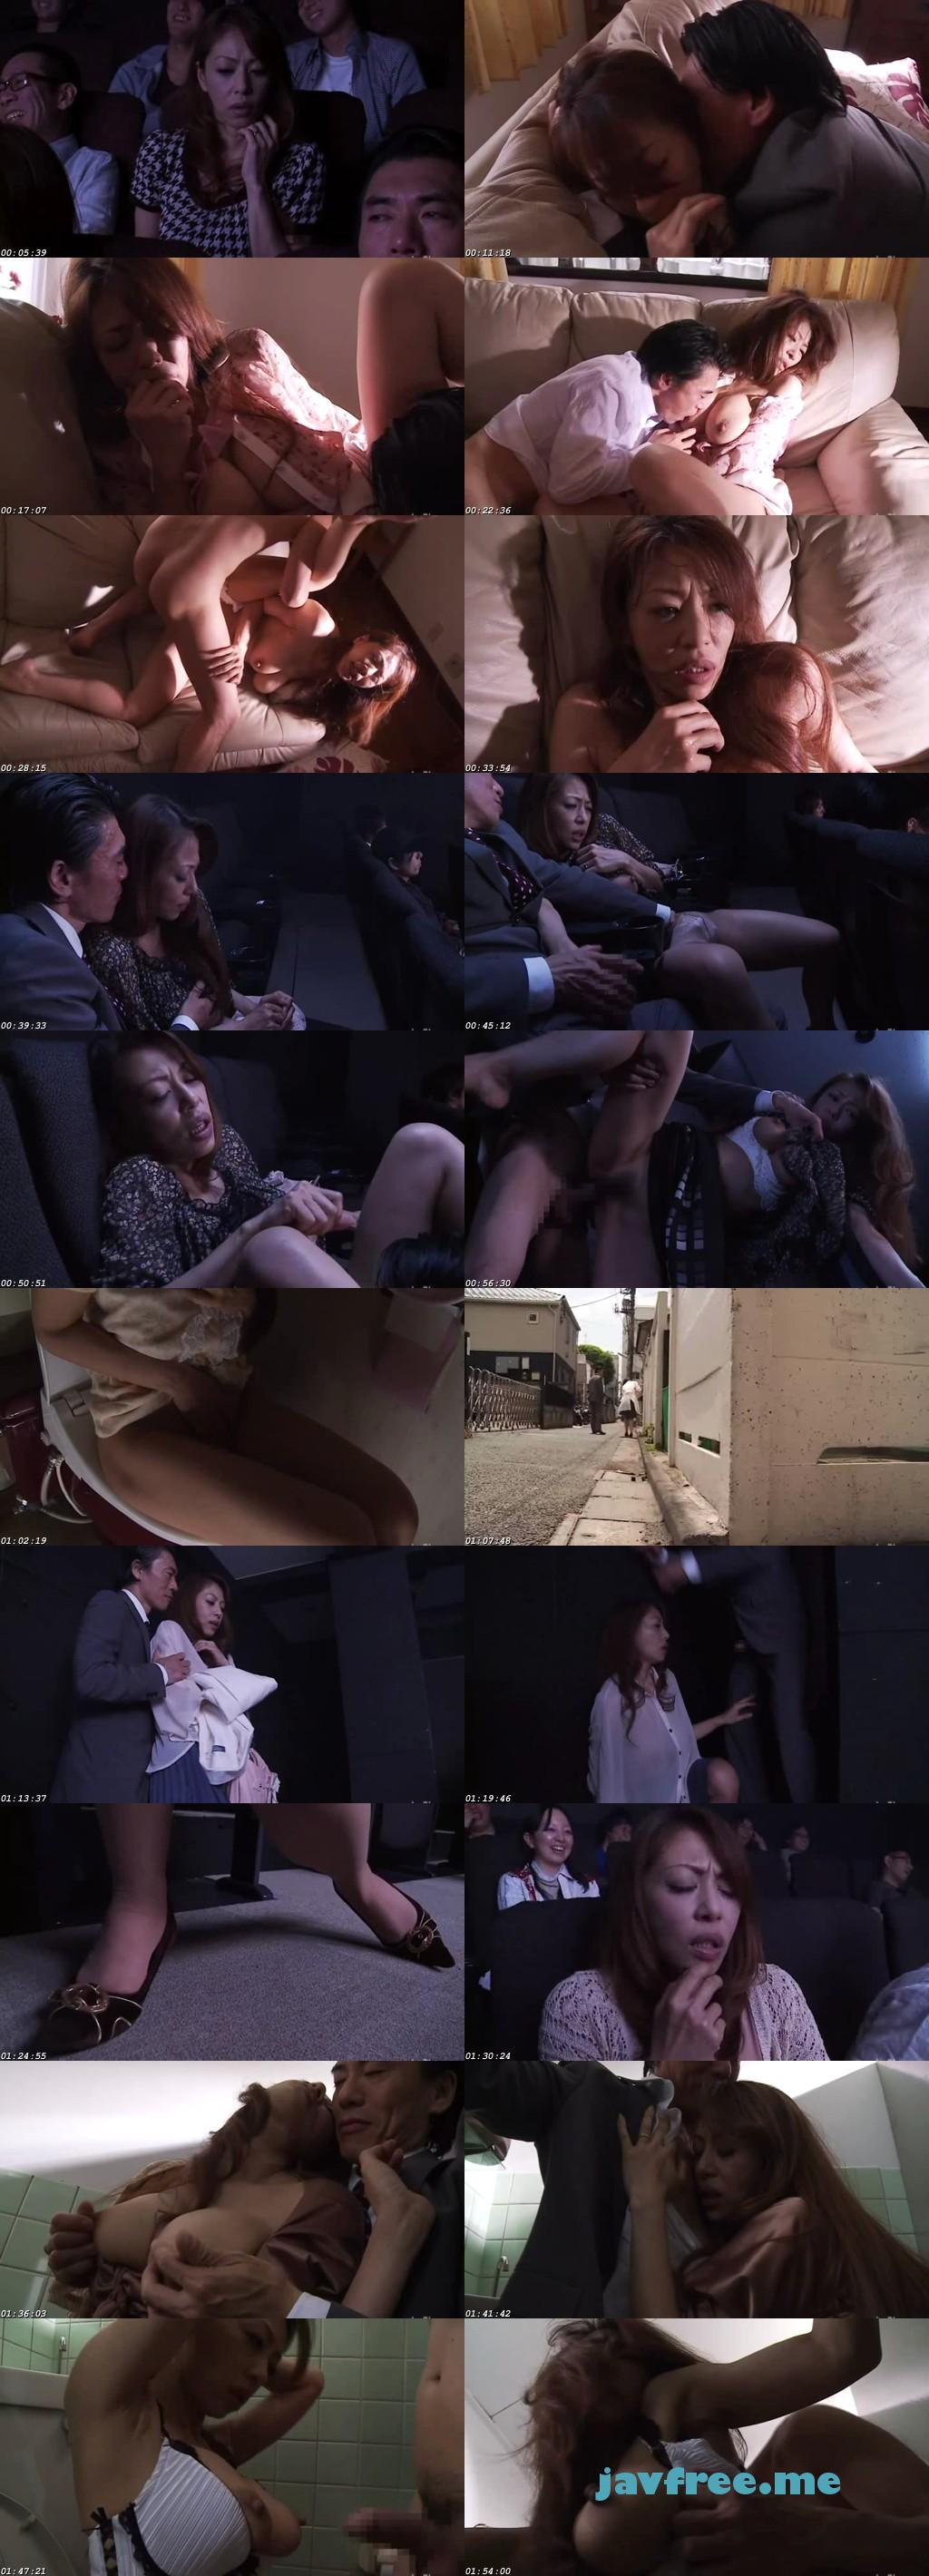 [RBD-438] 痴漢映画館 4 こんな所で…なのに、なのに私ったら…! 麻生早苗 - image RBD-438 on https://javfree.me